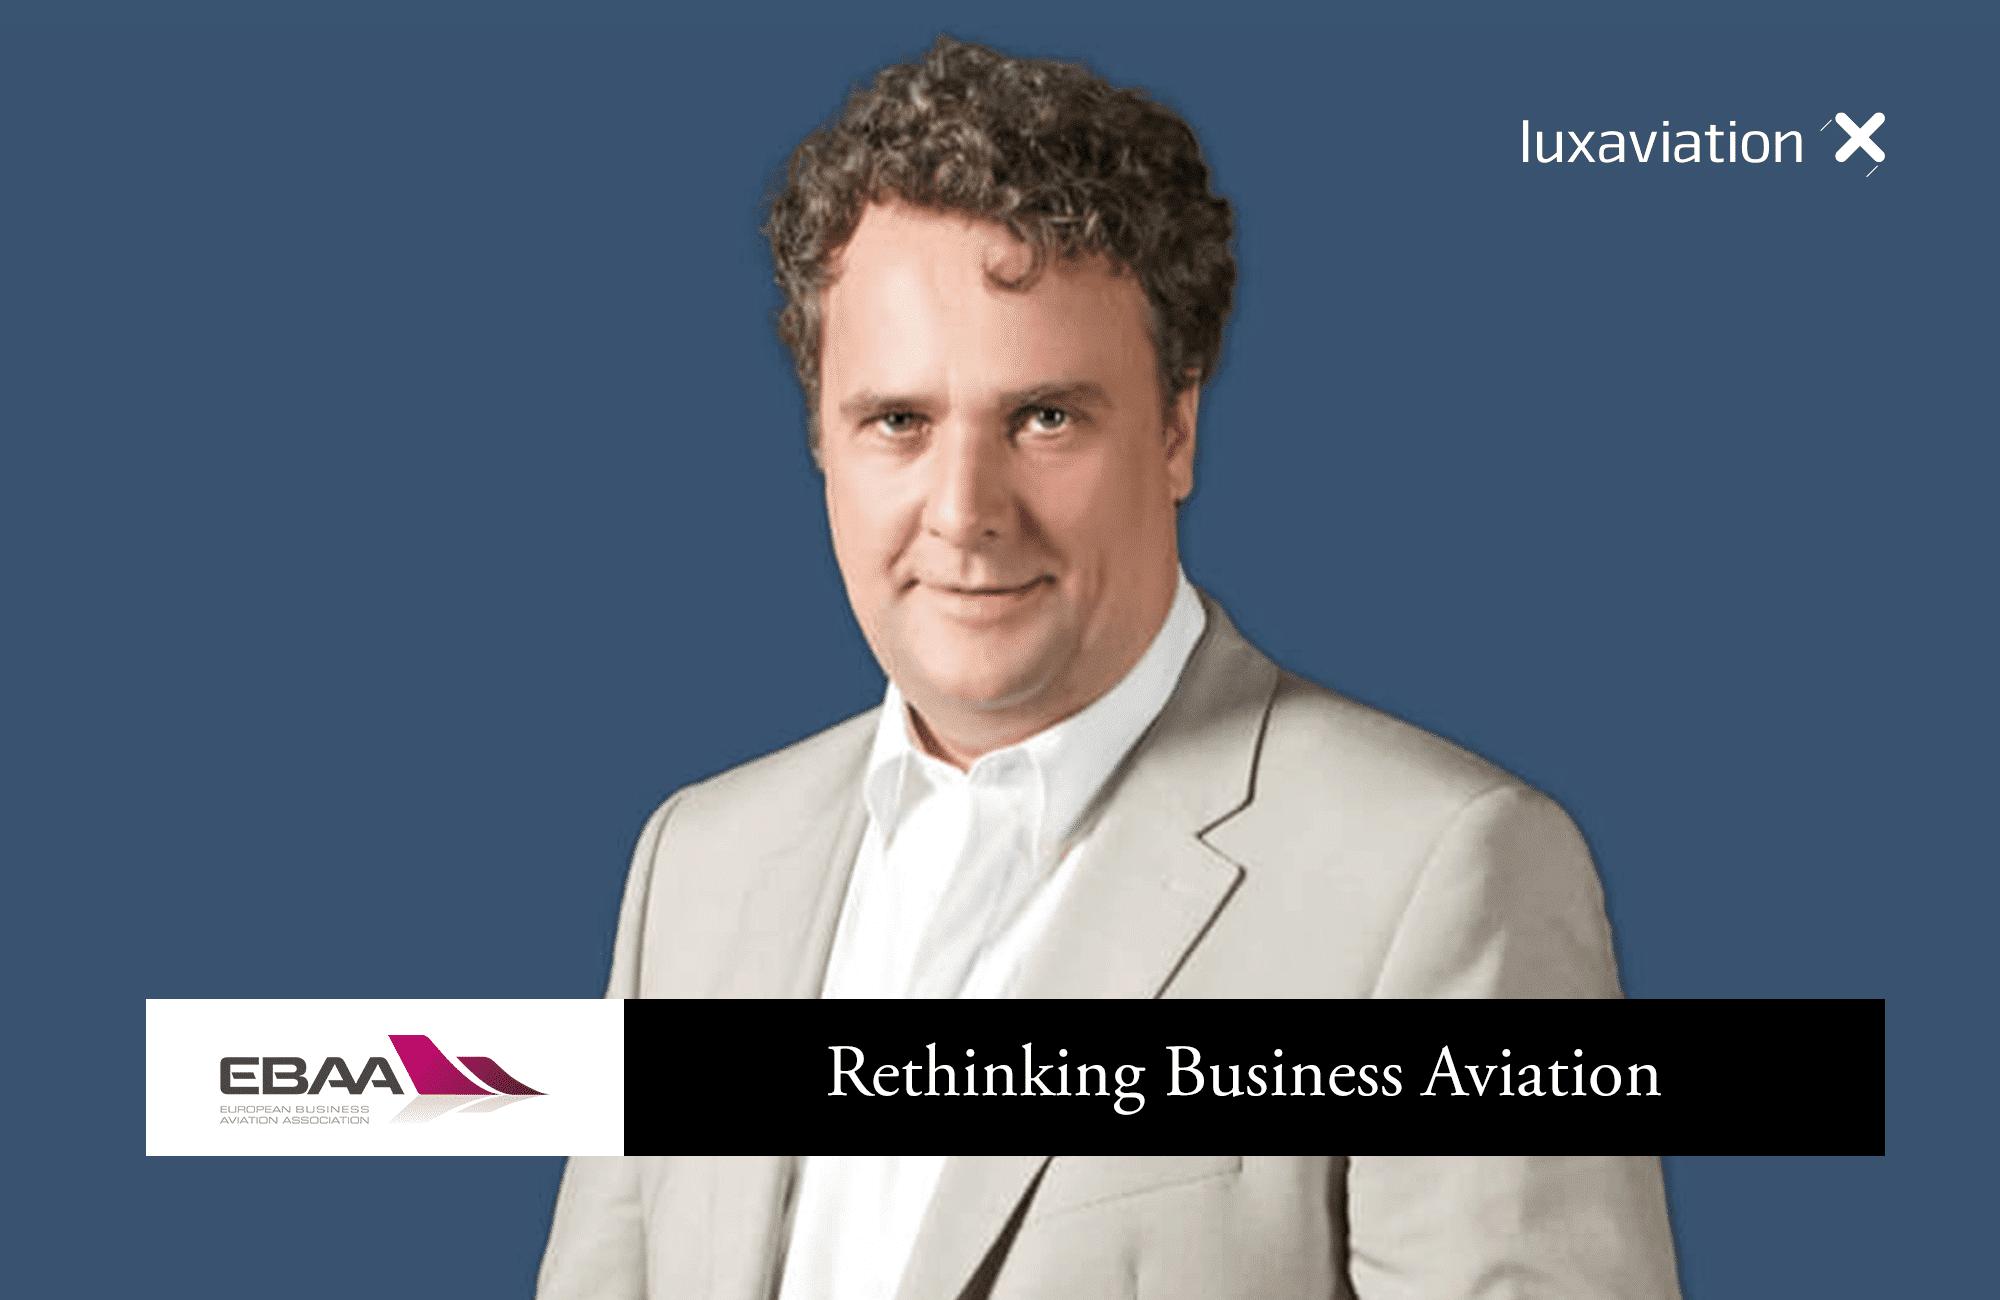 EBAA: Rethinking business aviation